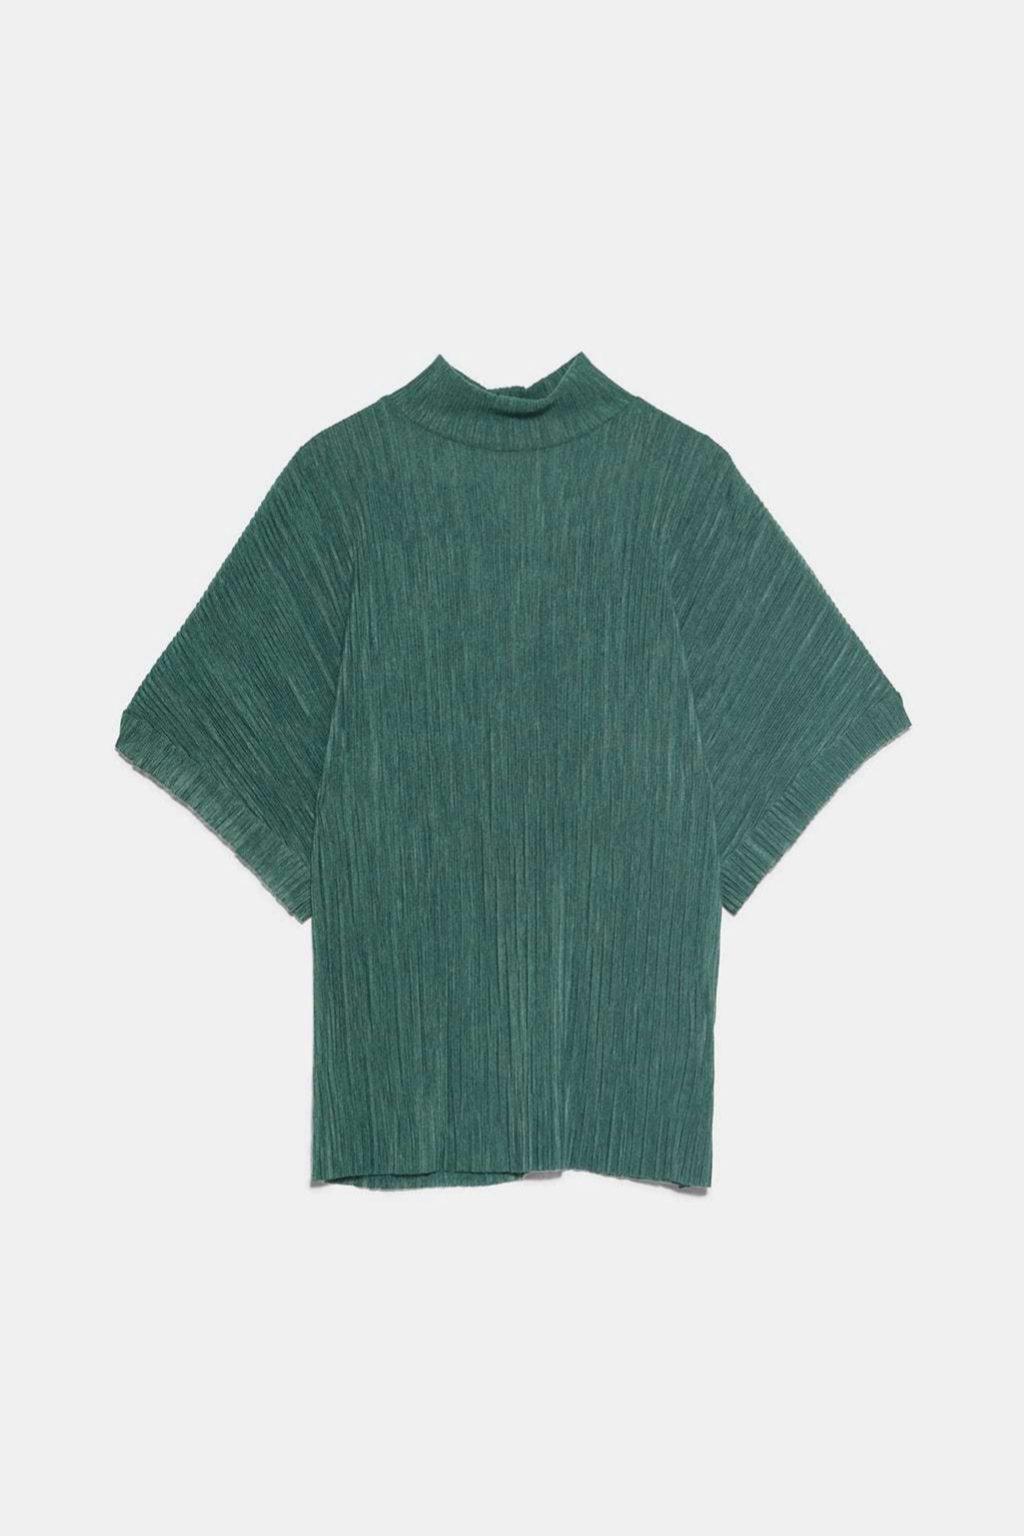 Camiseta plisada en verde botella de Zara